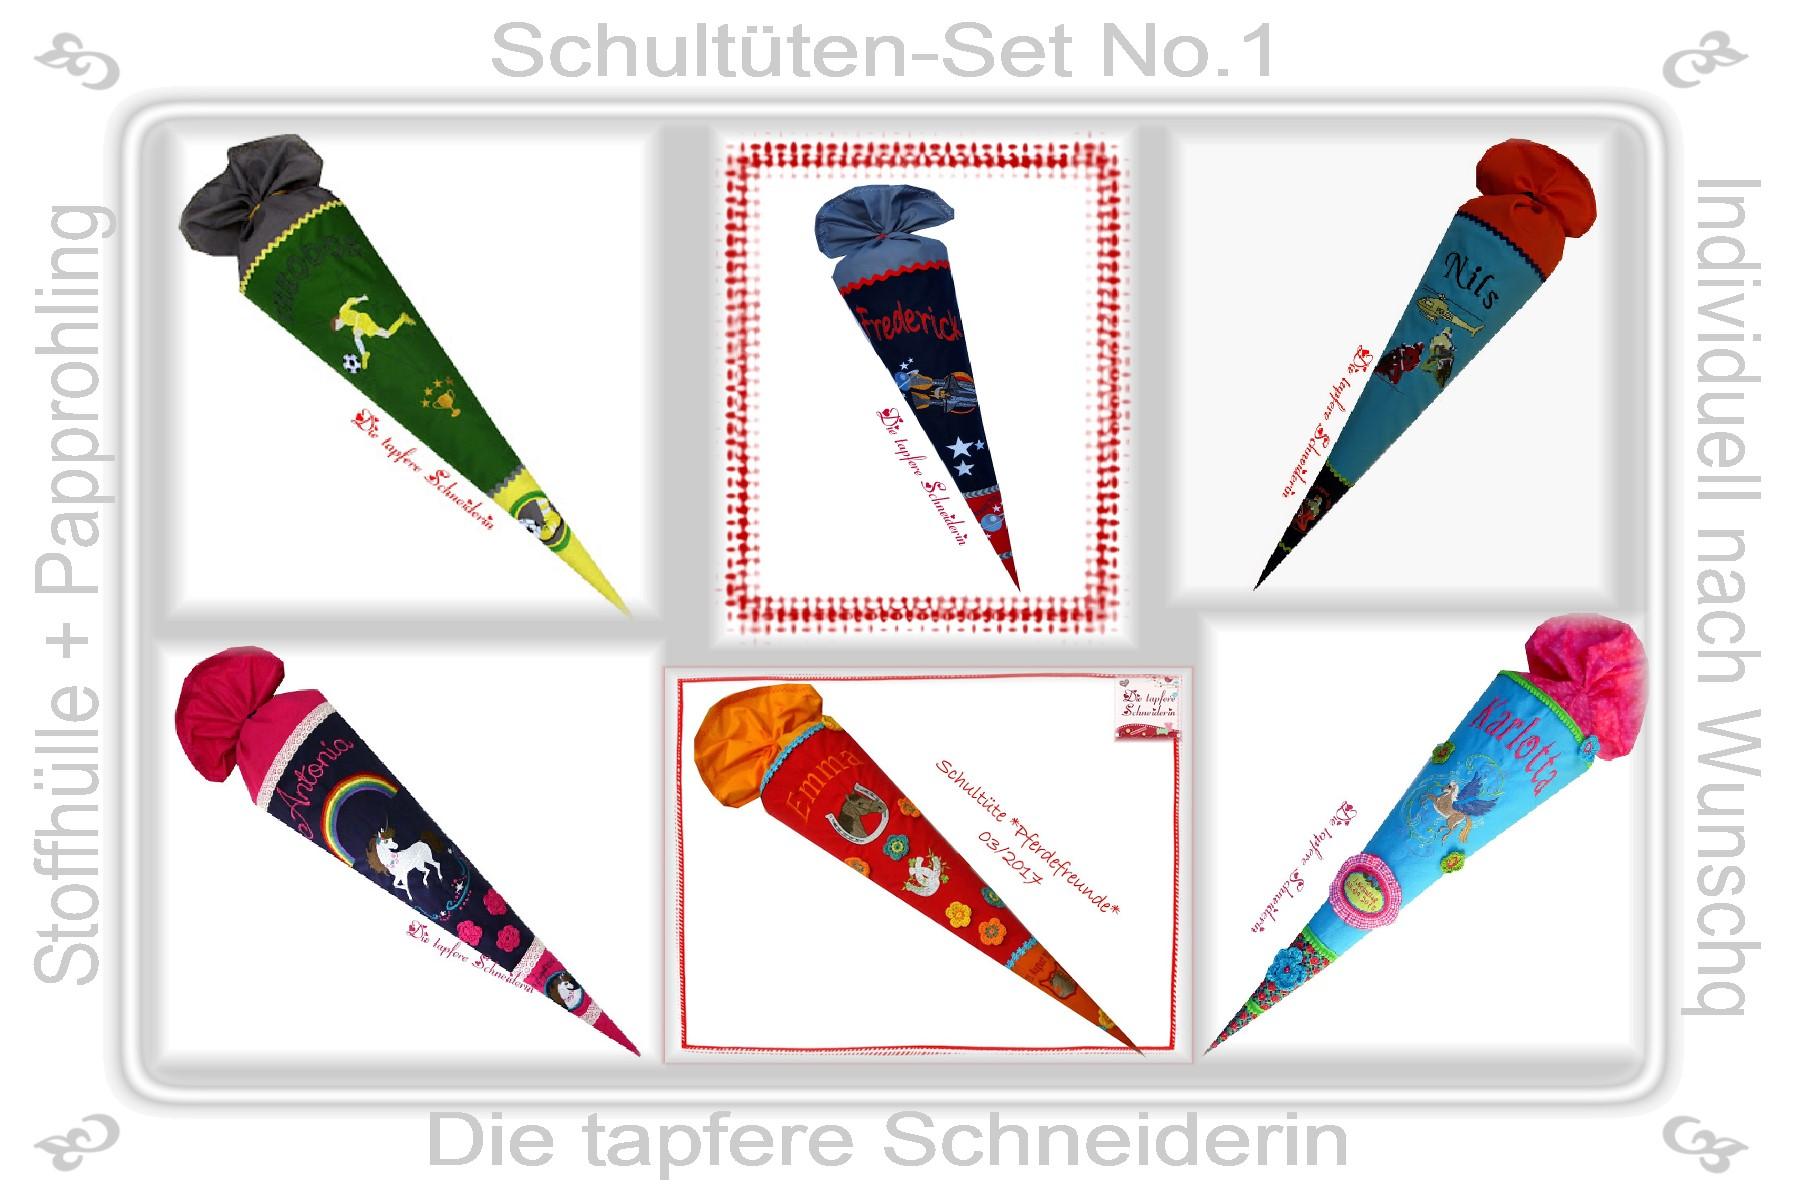 Schultüten-Set Nr. 1 / Individual-Produkt